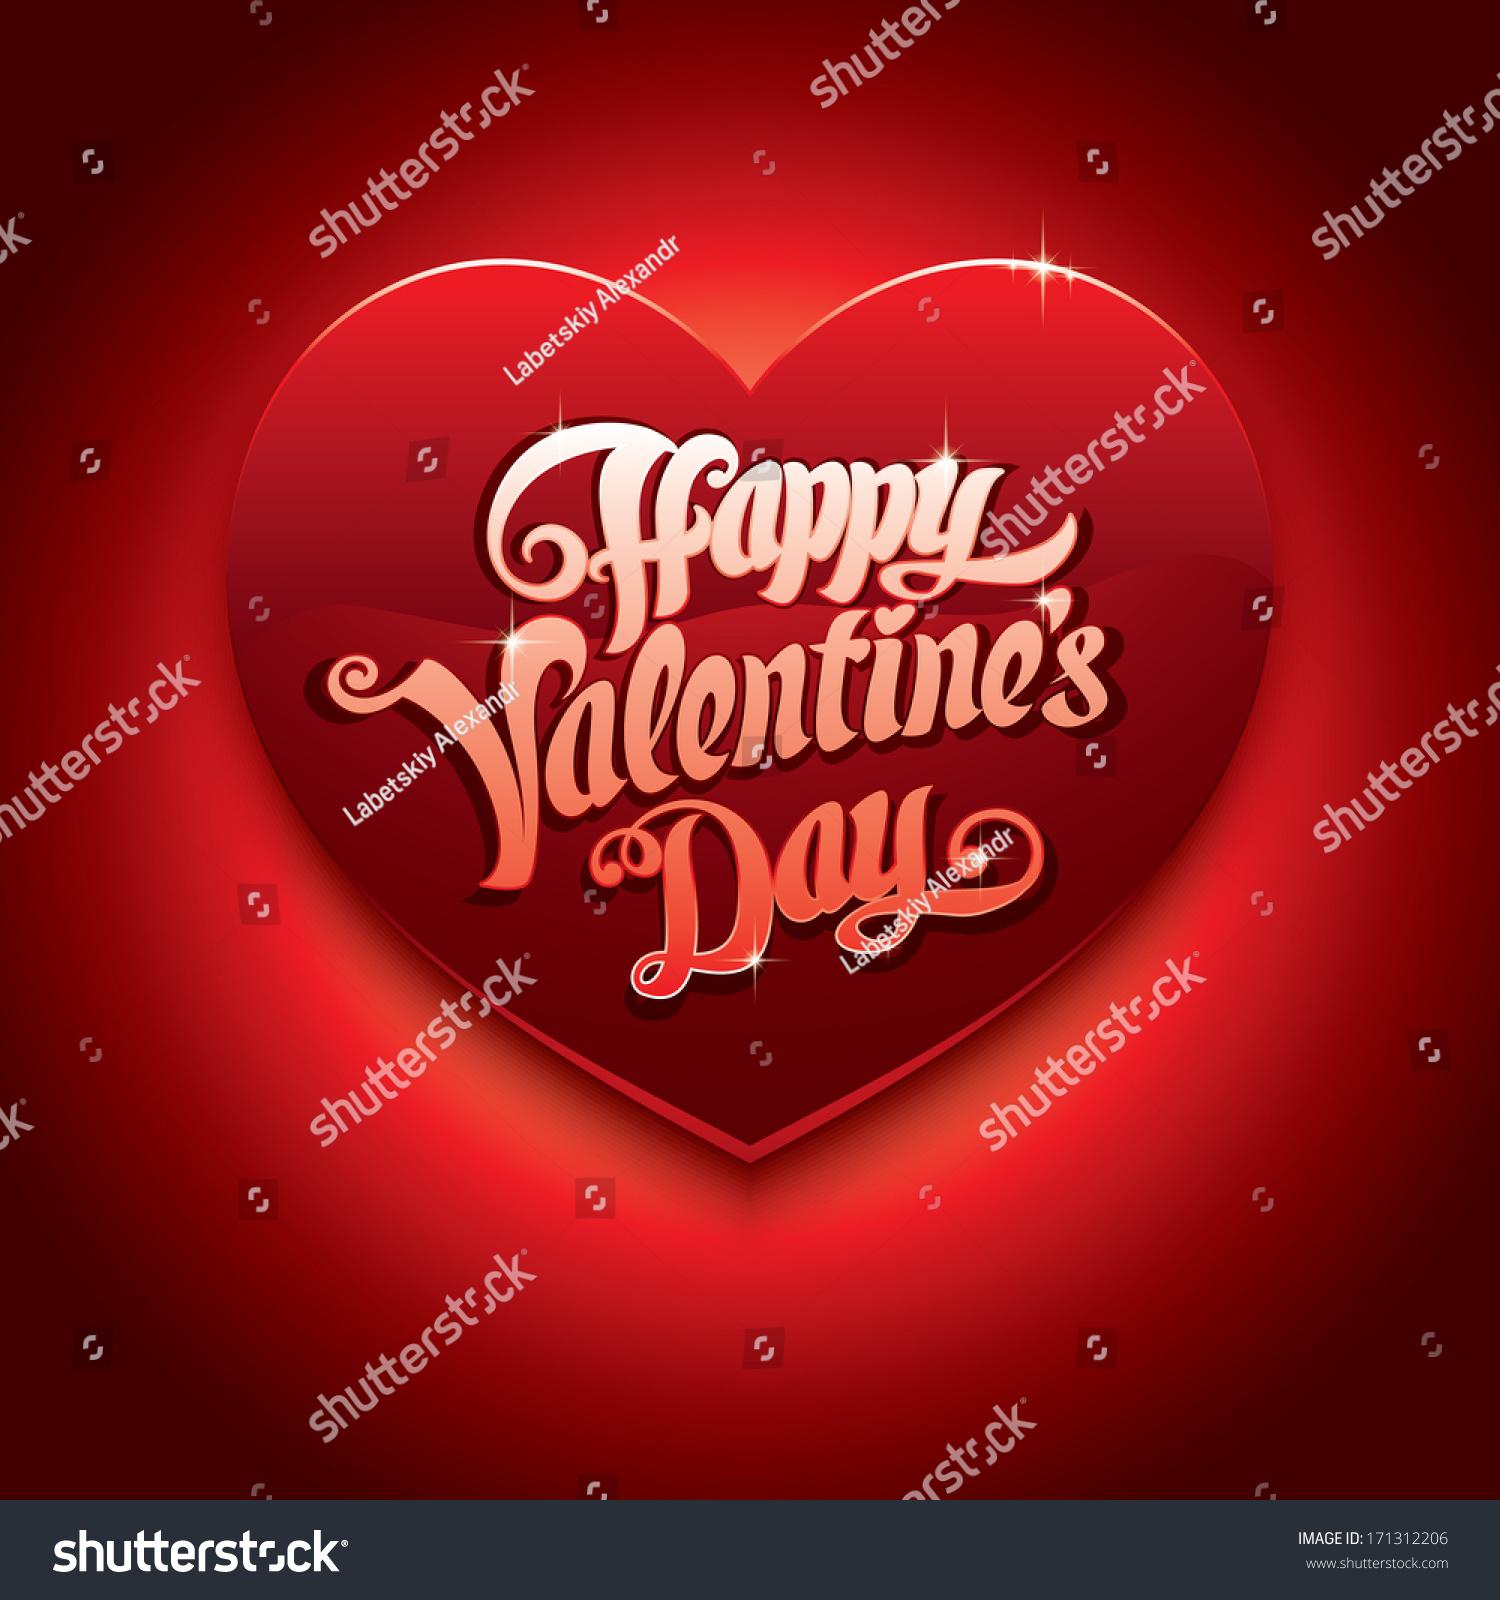 Vector Valentines Day Card Red Heart 庫存矢量圖 171312206 - Shutterstock